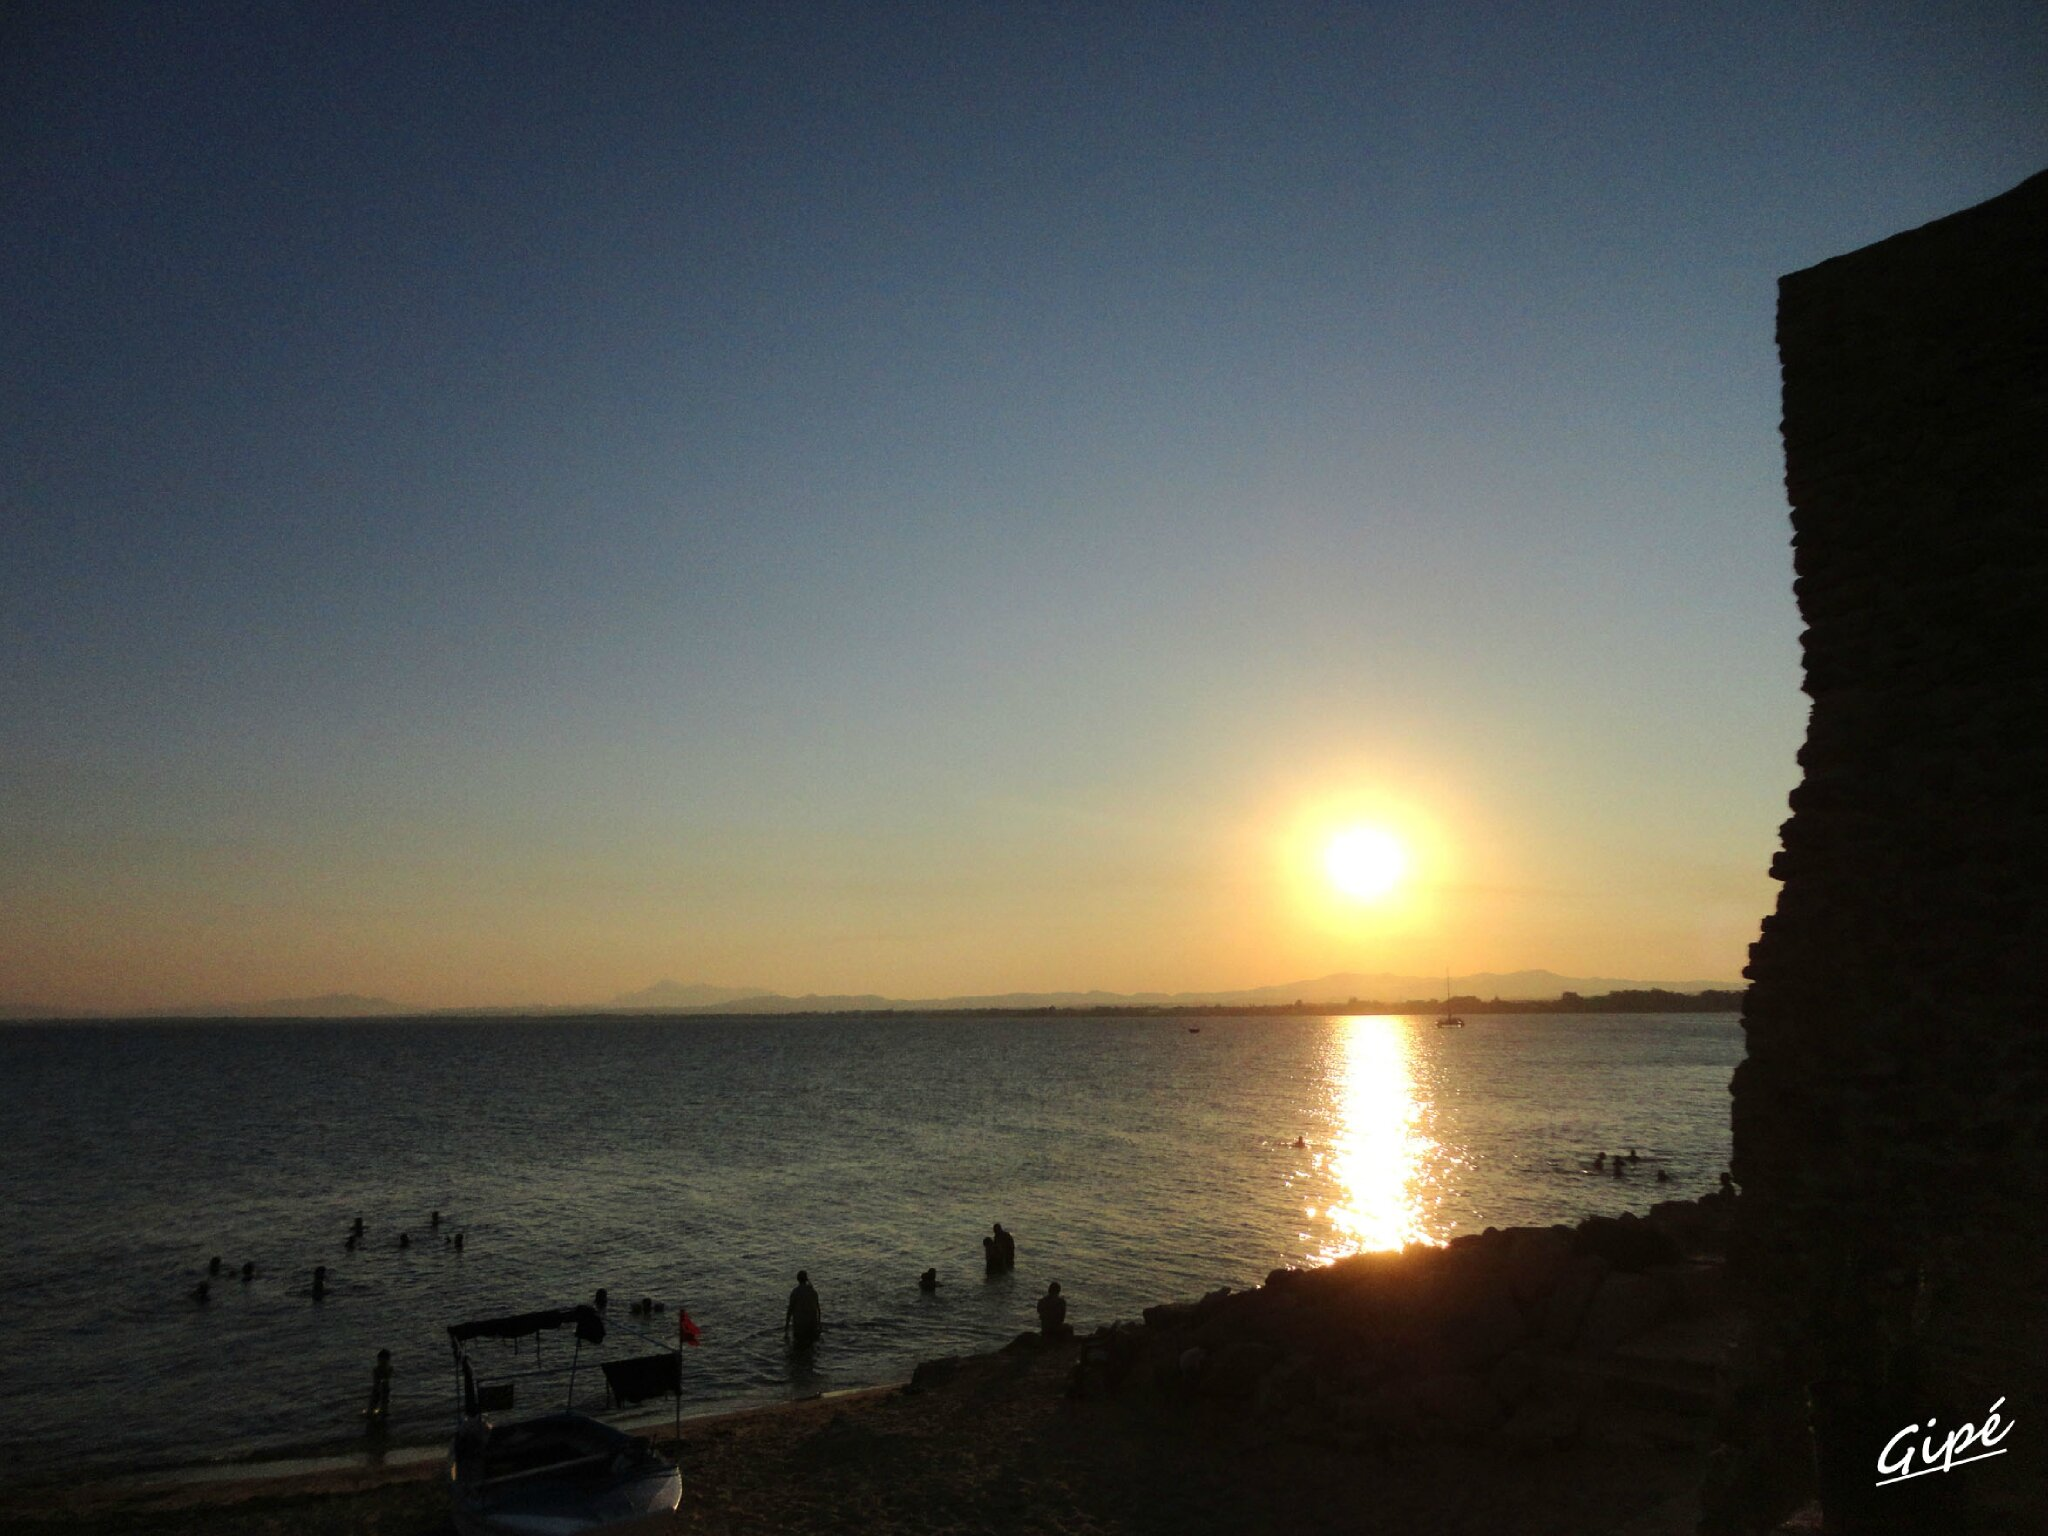 Coucher de soleil du jeudi 25 juillet 2013